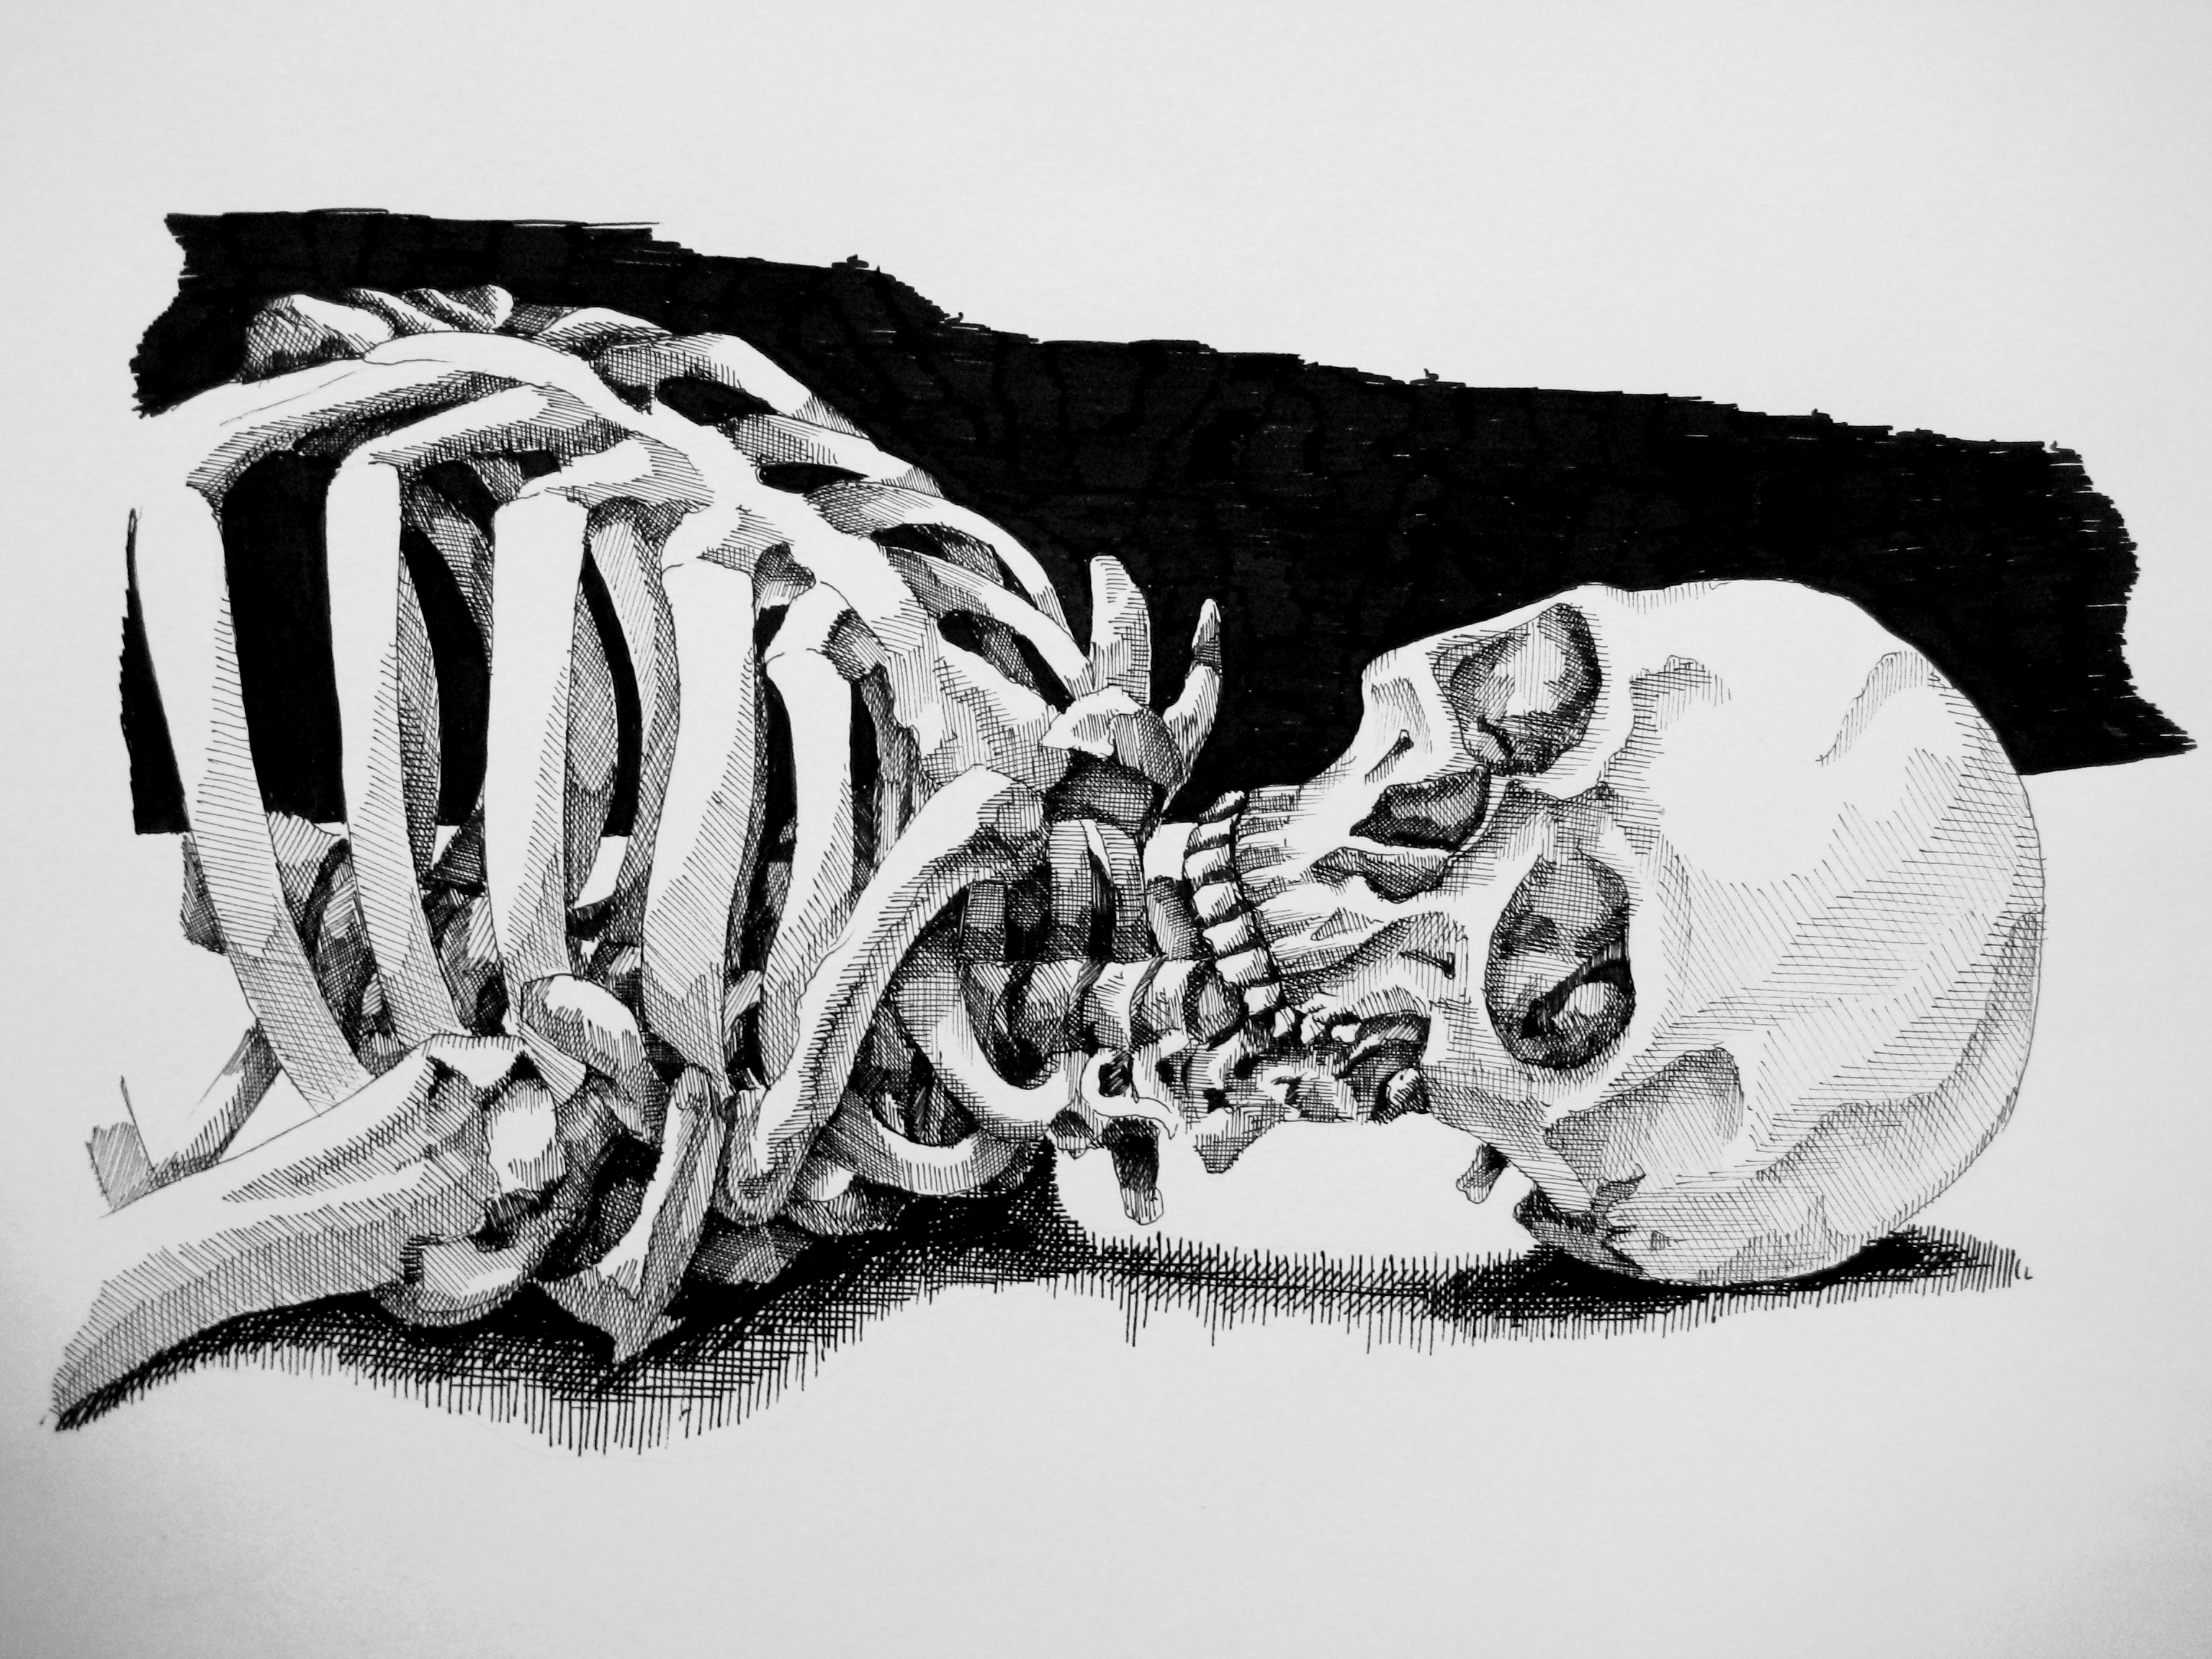 Drawn sleleton bone art Wreaked and The of wreaked